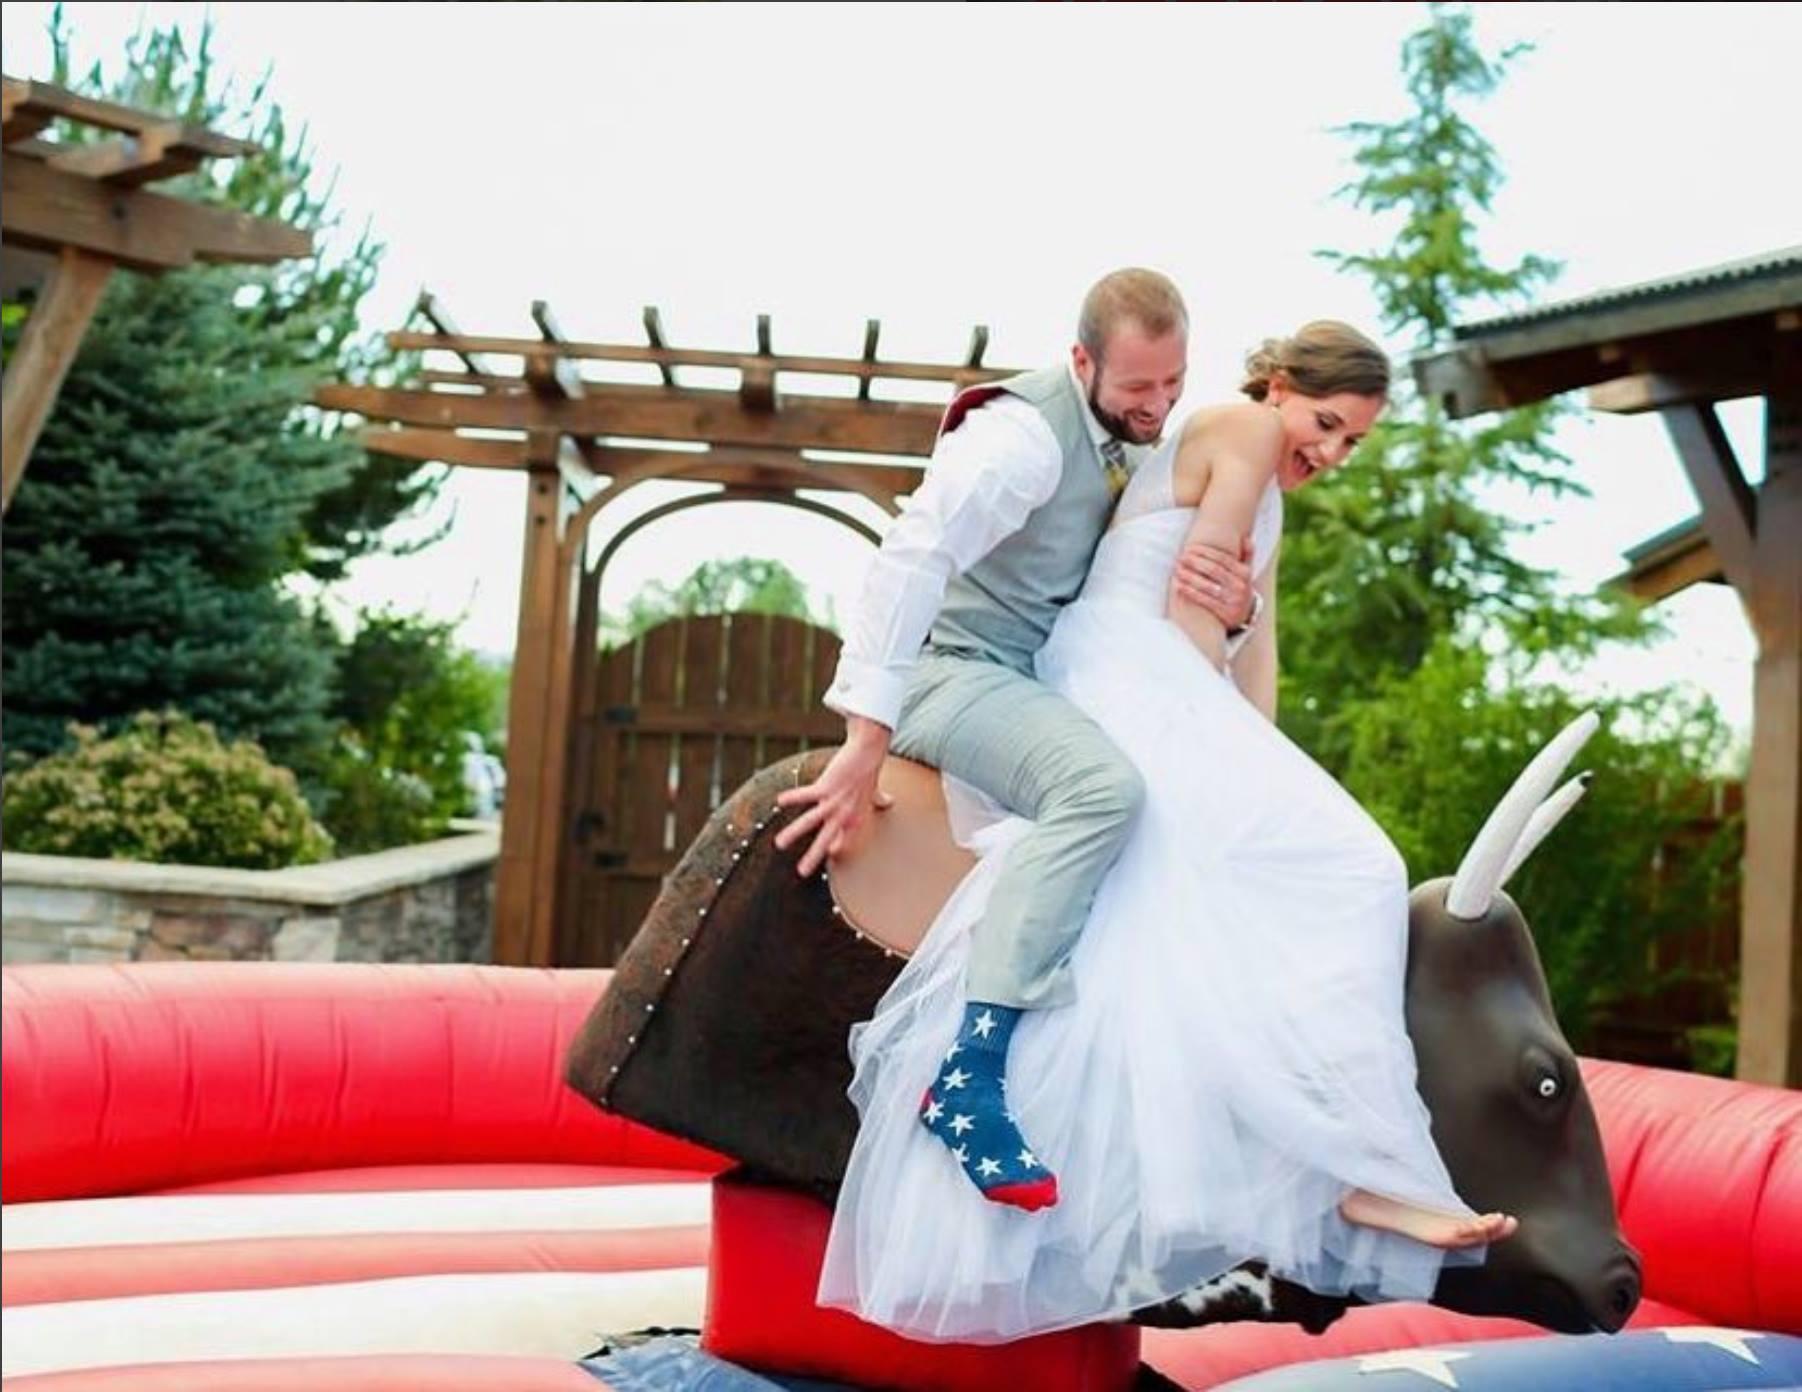 Wedding Mechanical Bull